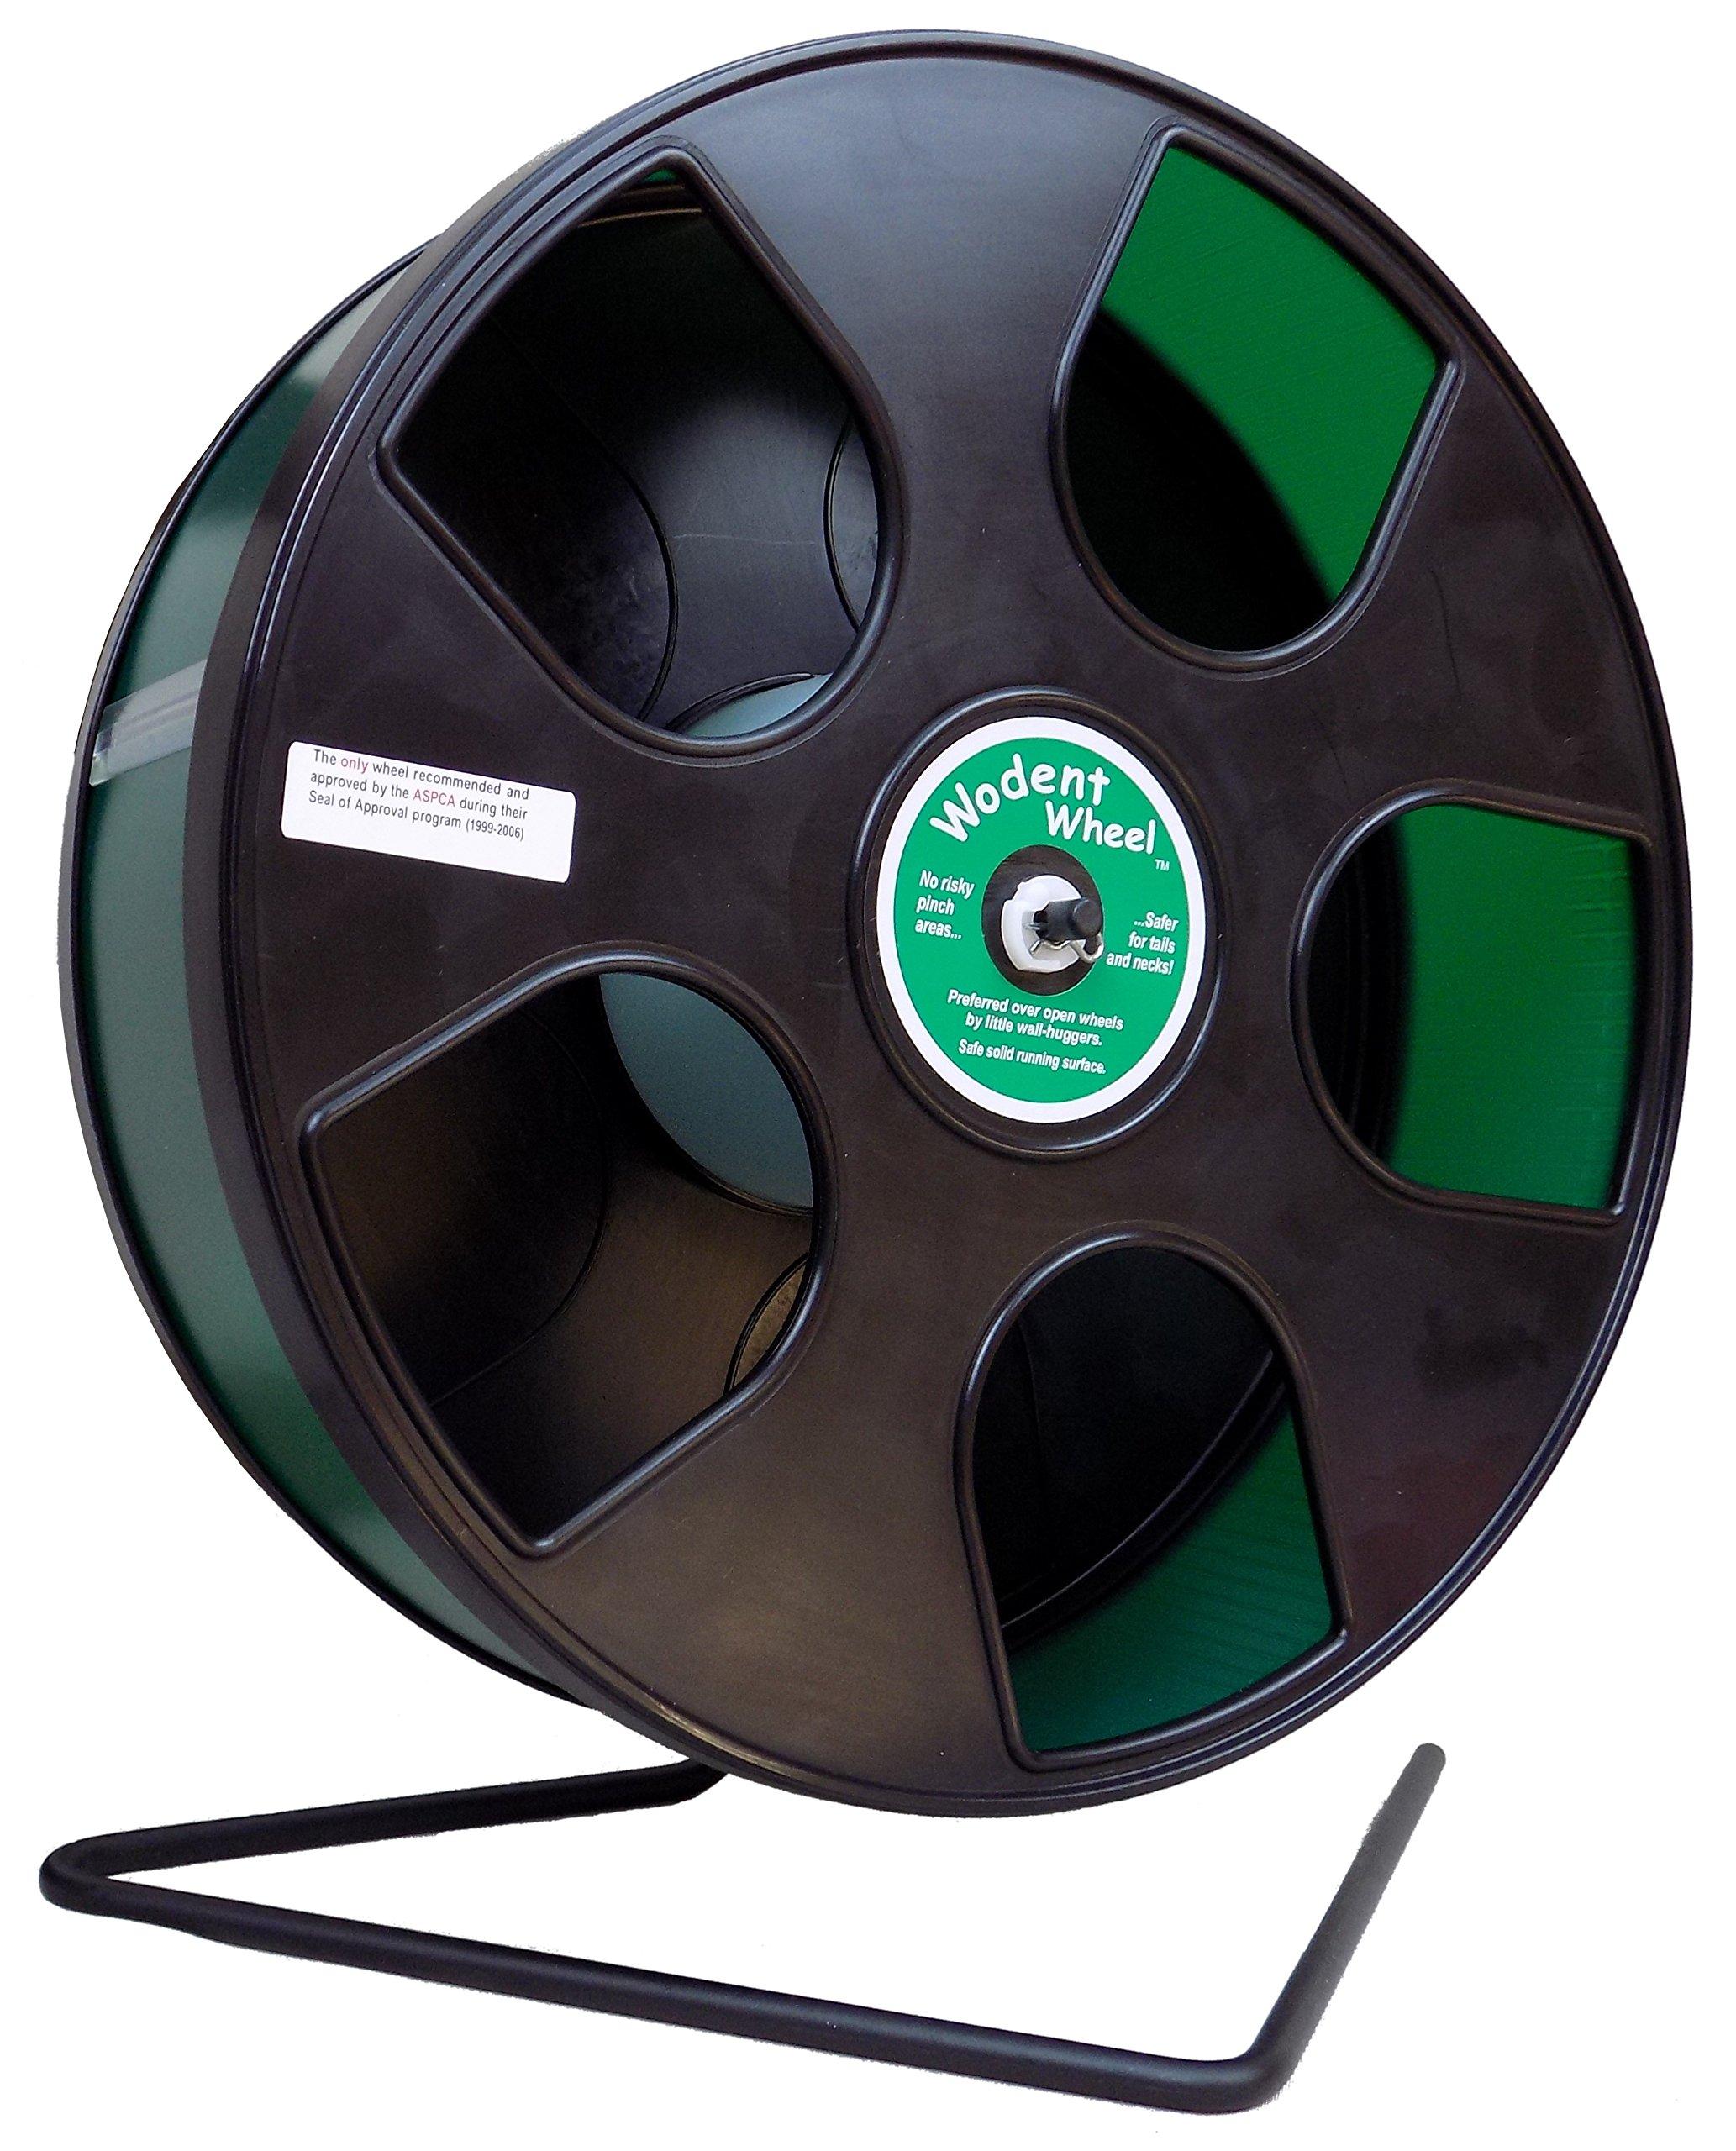 Wodent Wheel Senior & Tail Shield - 11'' running wheel for small pets